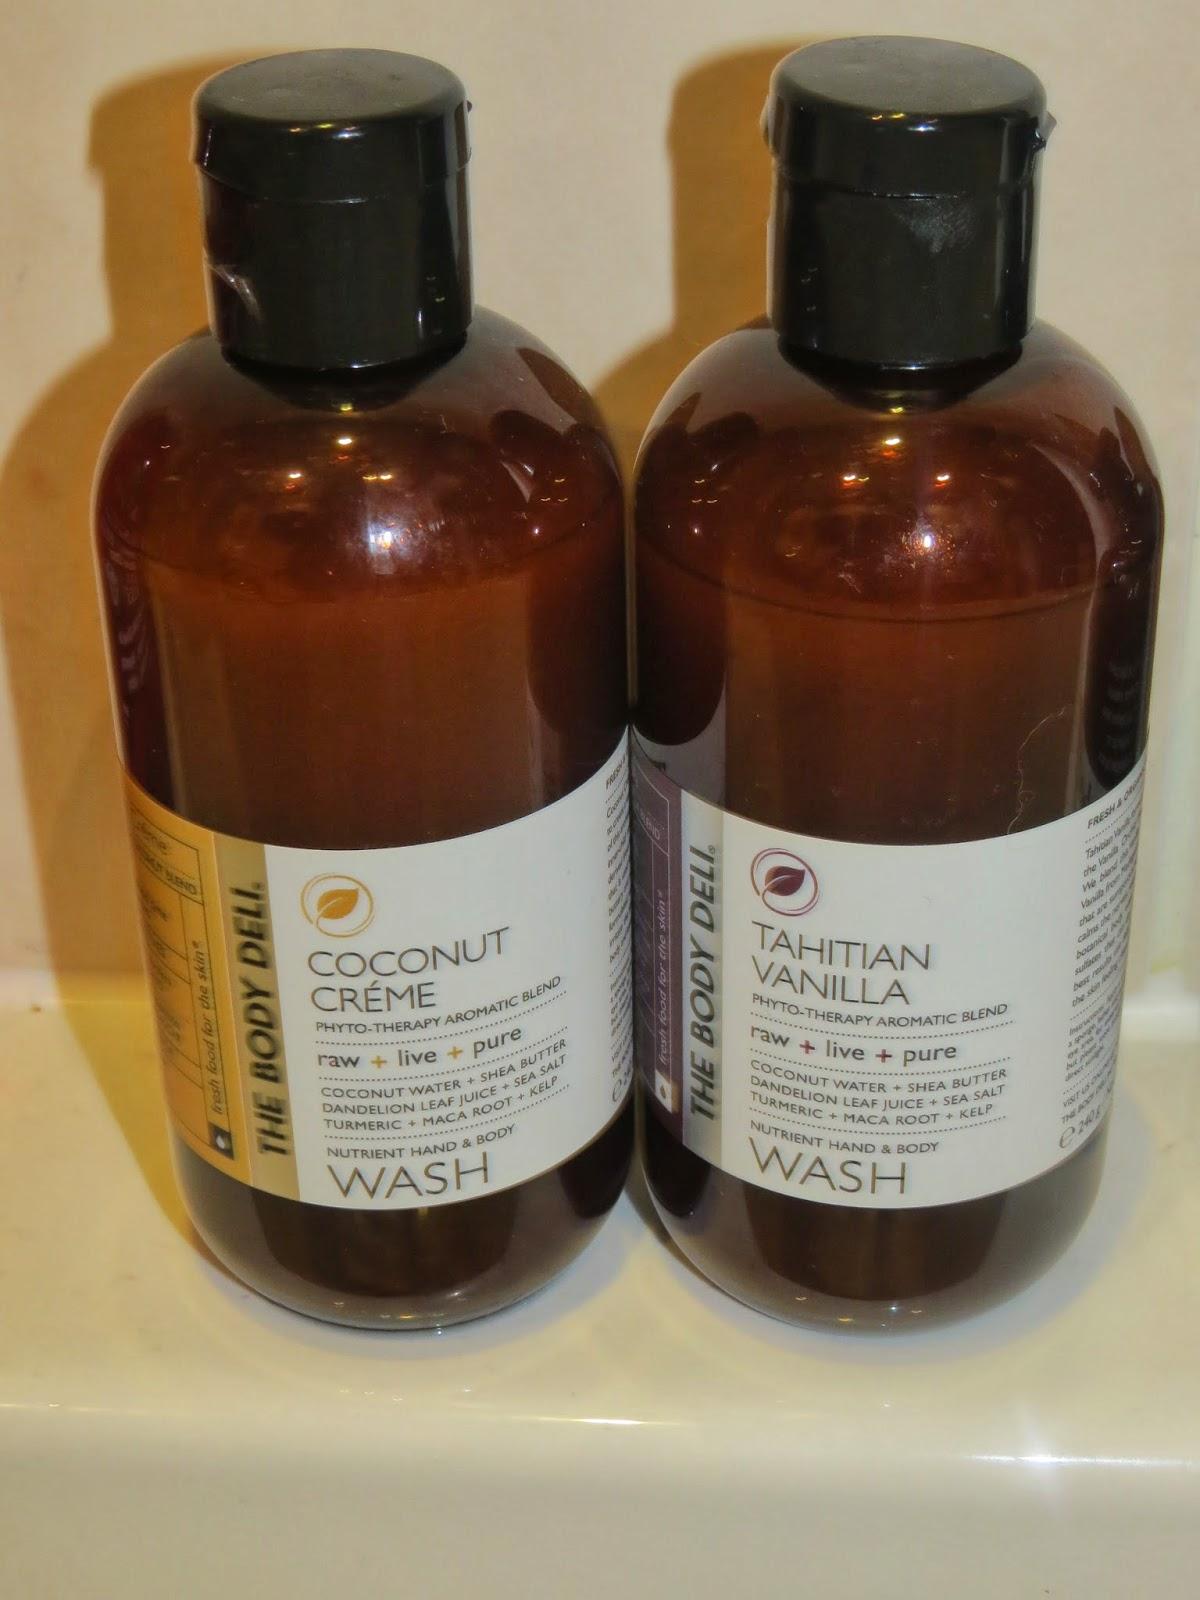 Beauty Balm The Body Deli Nutrient Hand & Body Wash